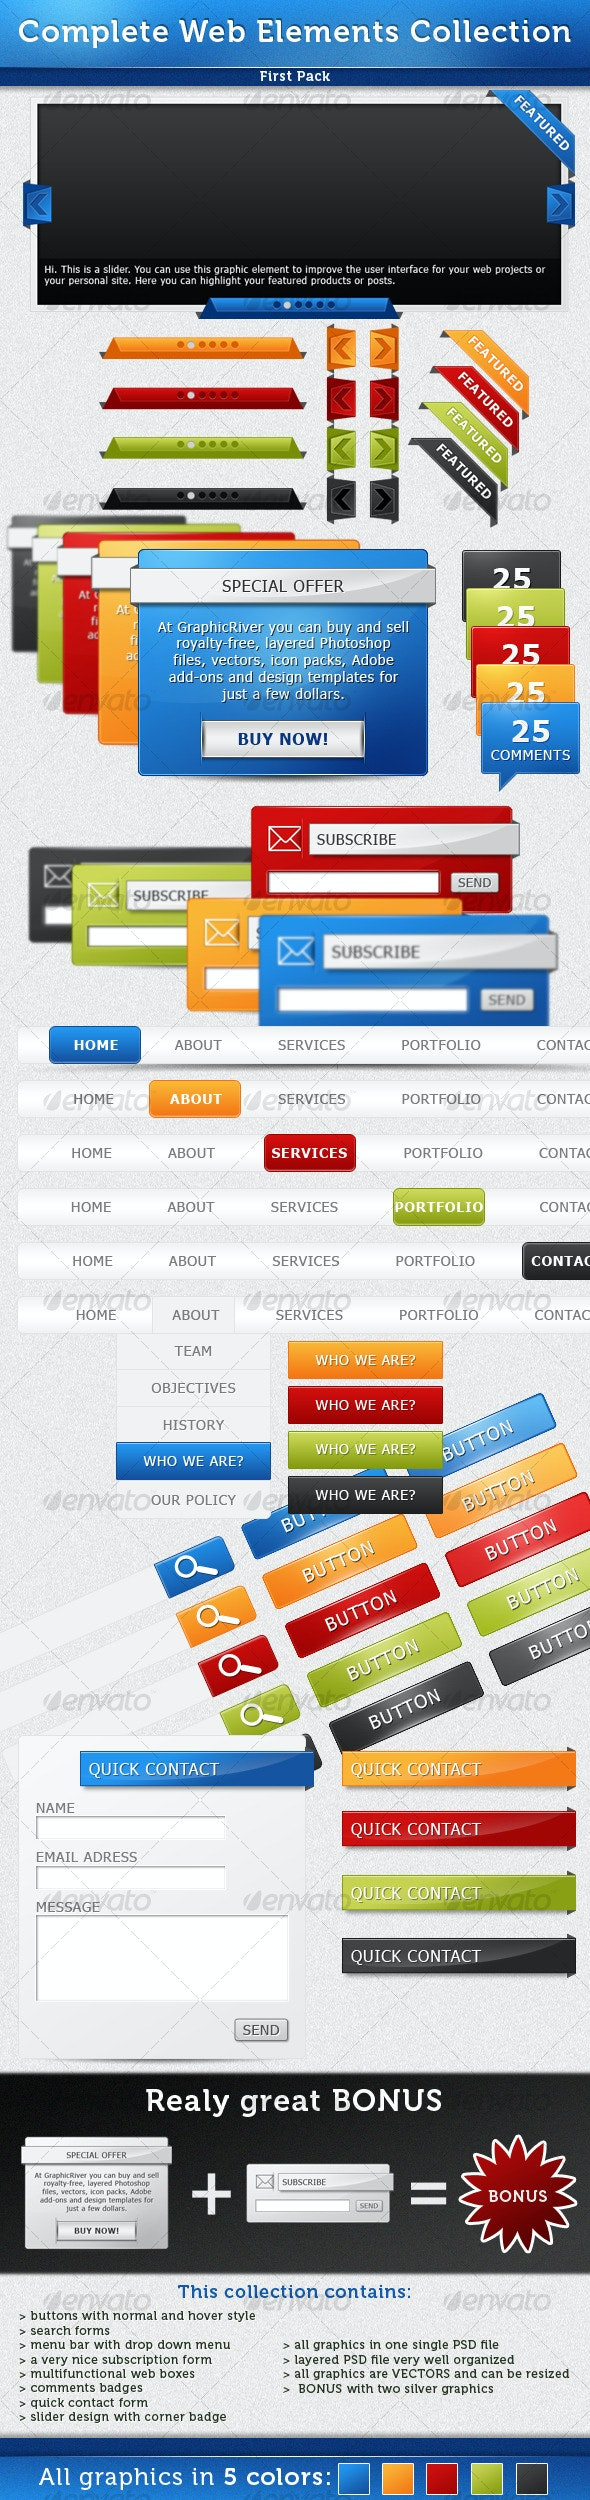 Complete Web Elements Collection - Pack1 - Miscellaneous Web Elements